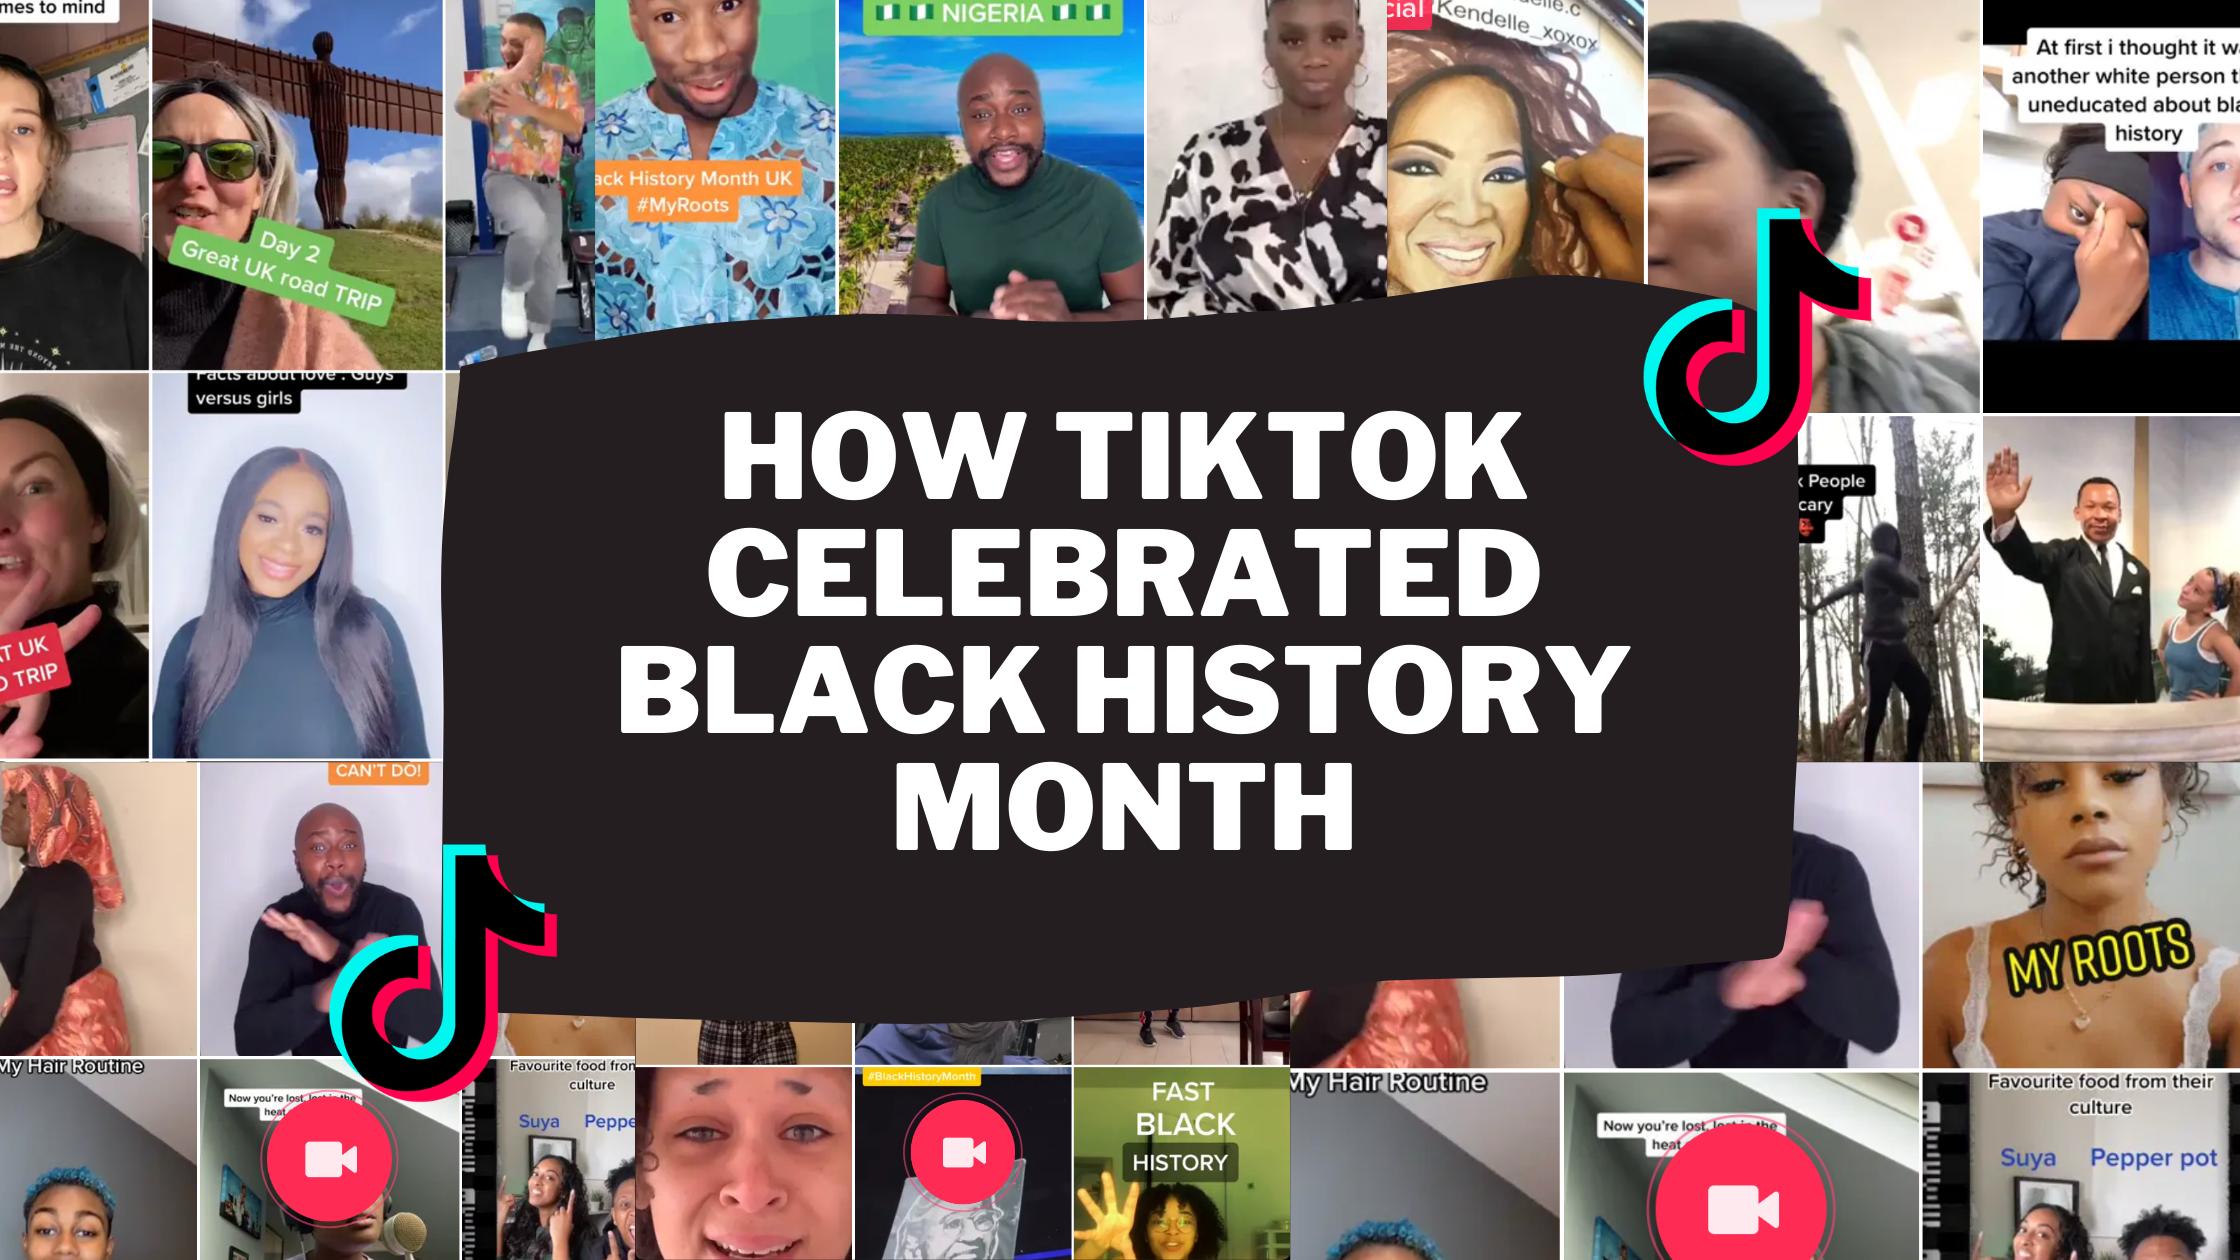 How TikTok Celebrated Black History Month